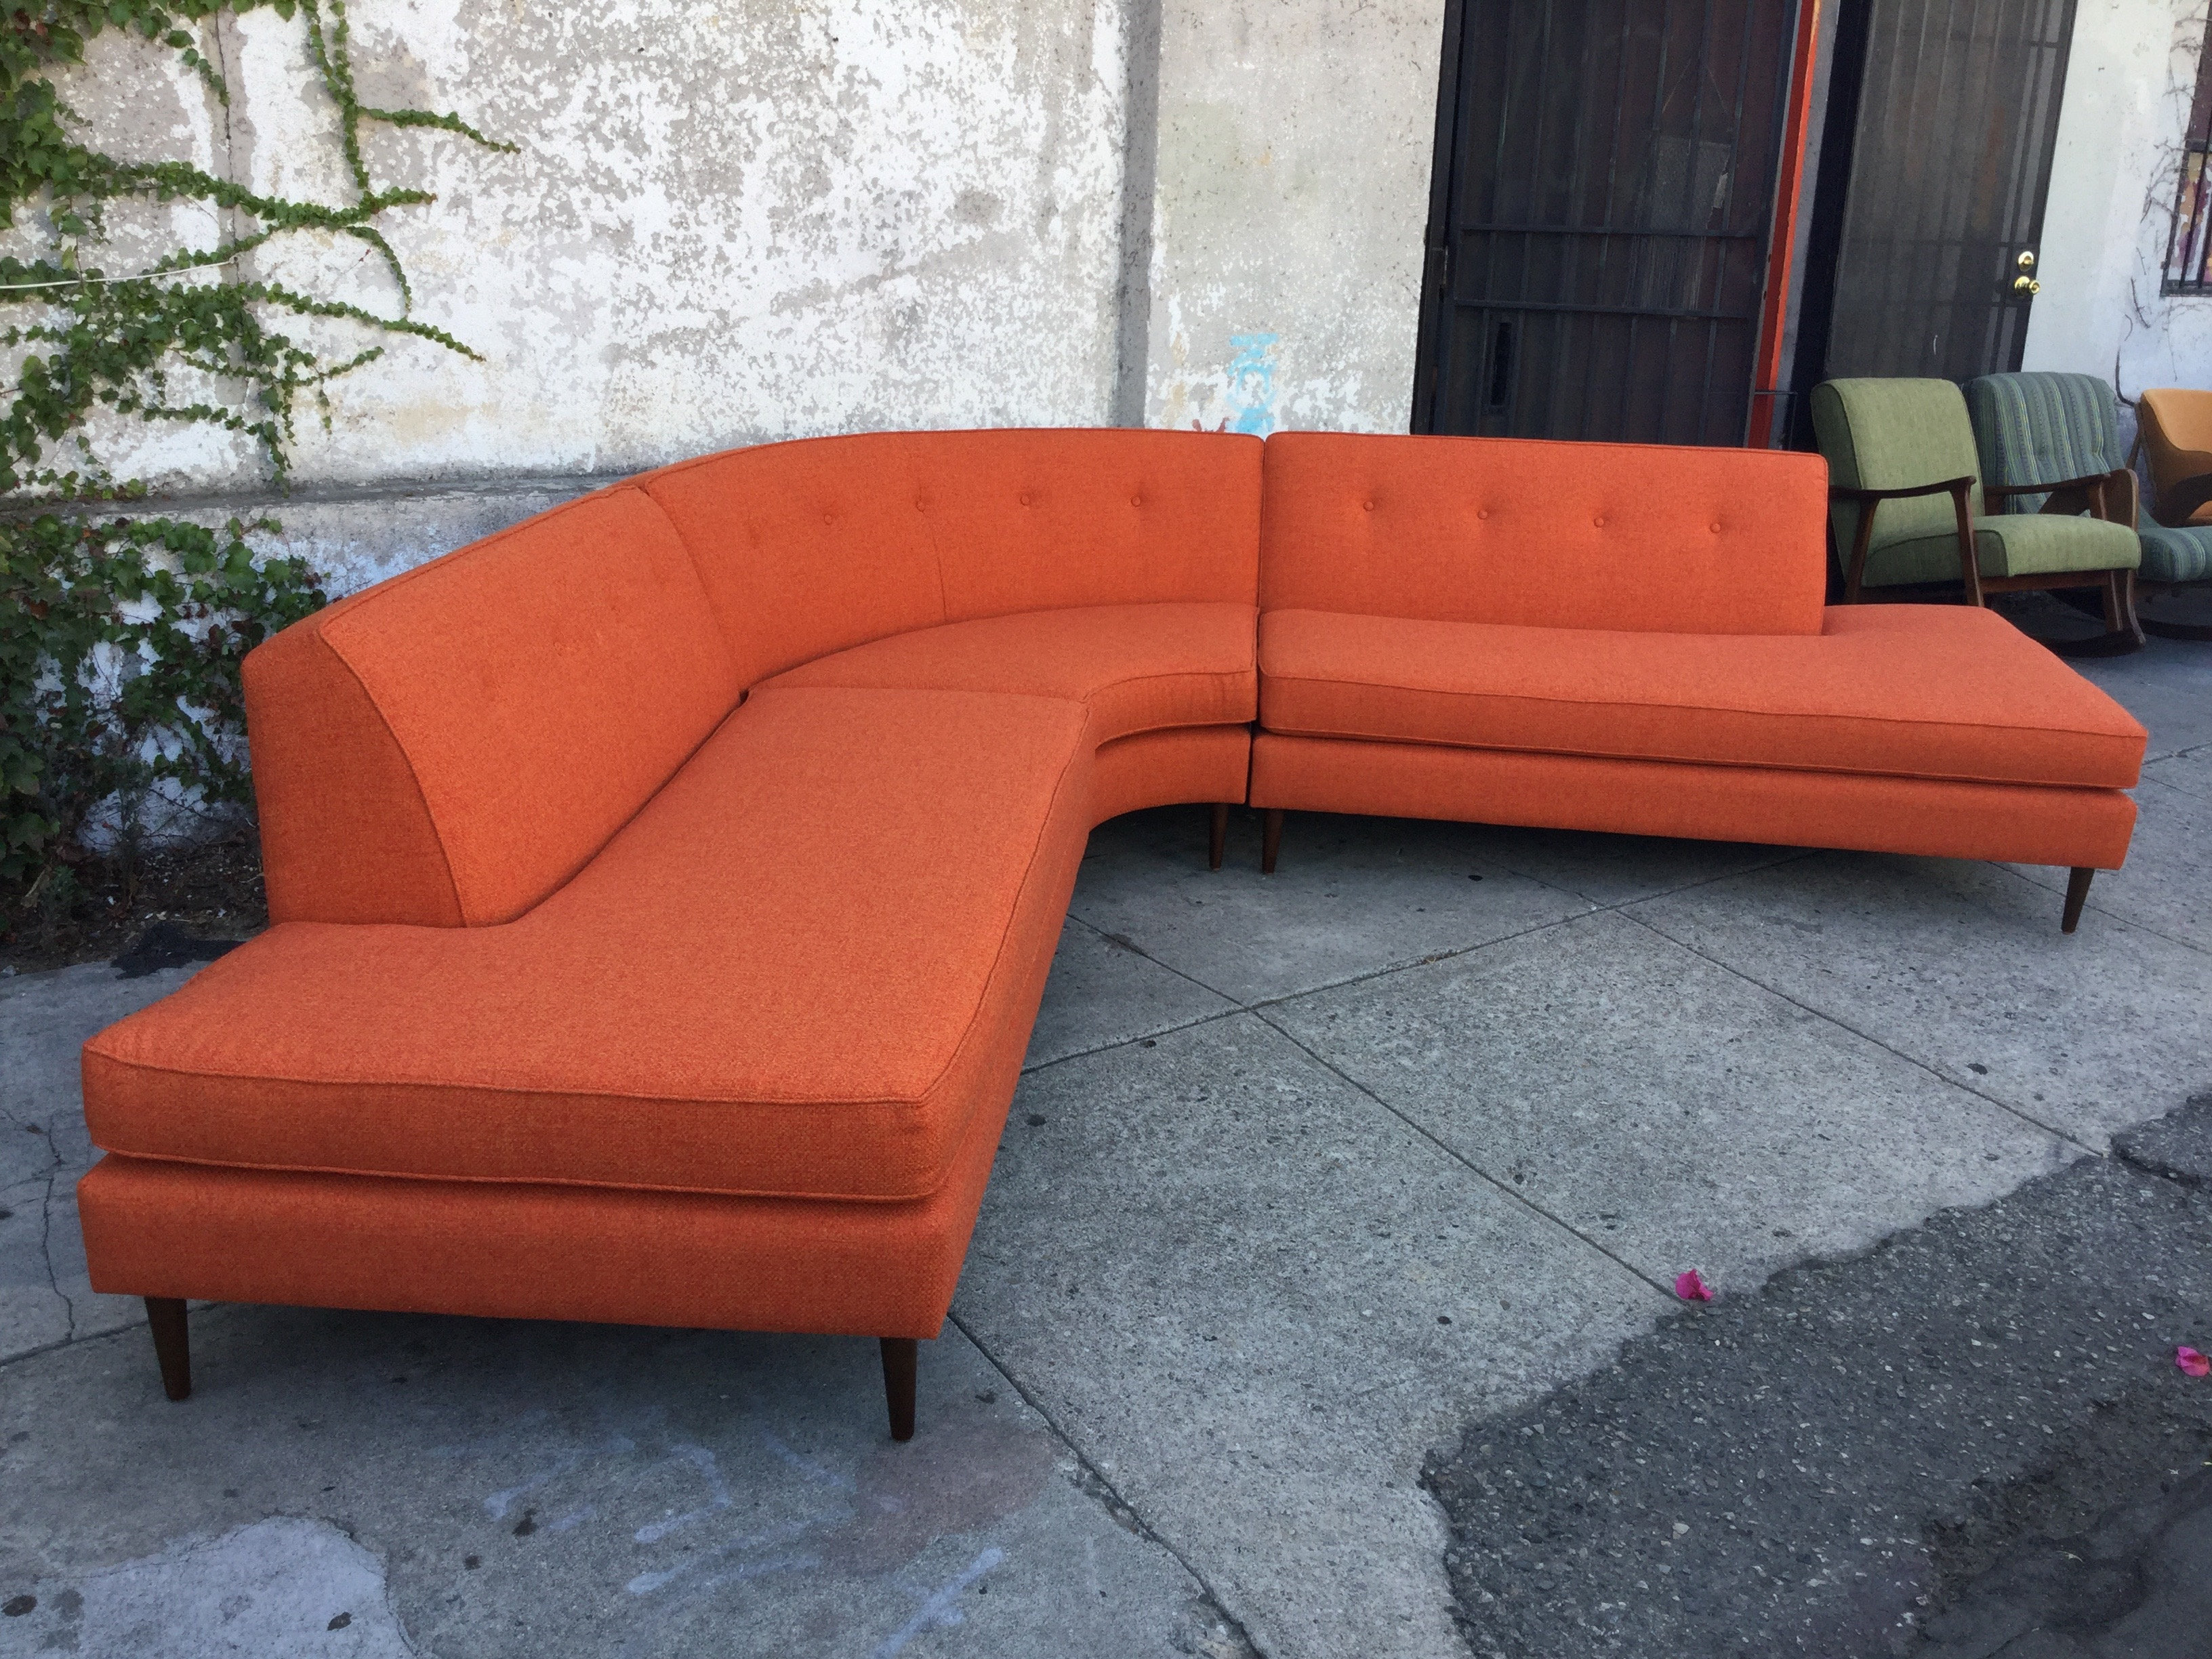 Orange Tweed Sectional Curved Sofa Sunbeam Vintage